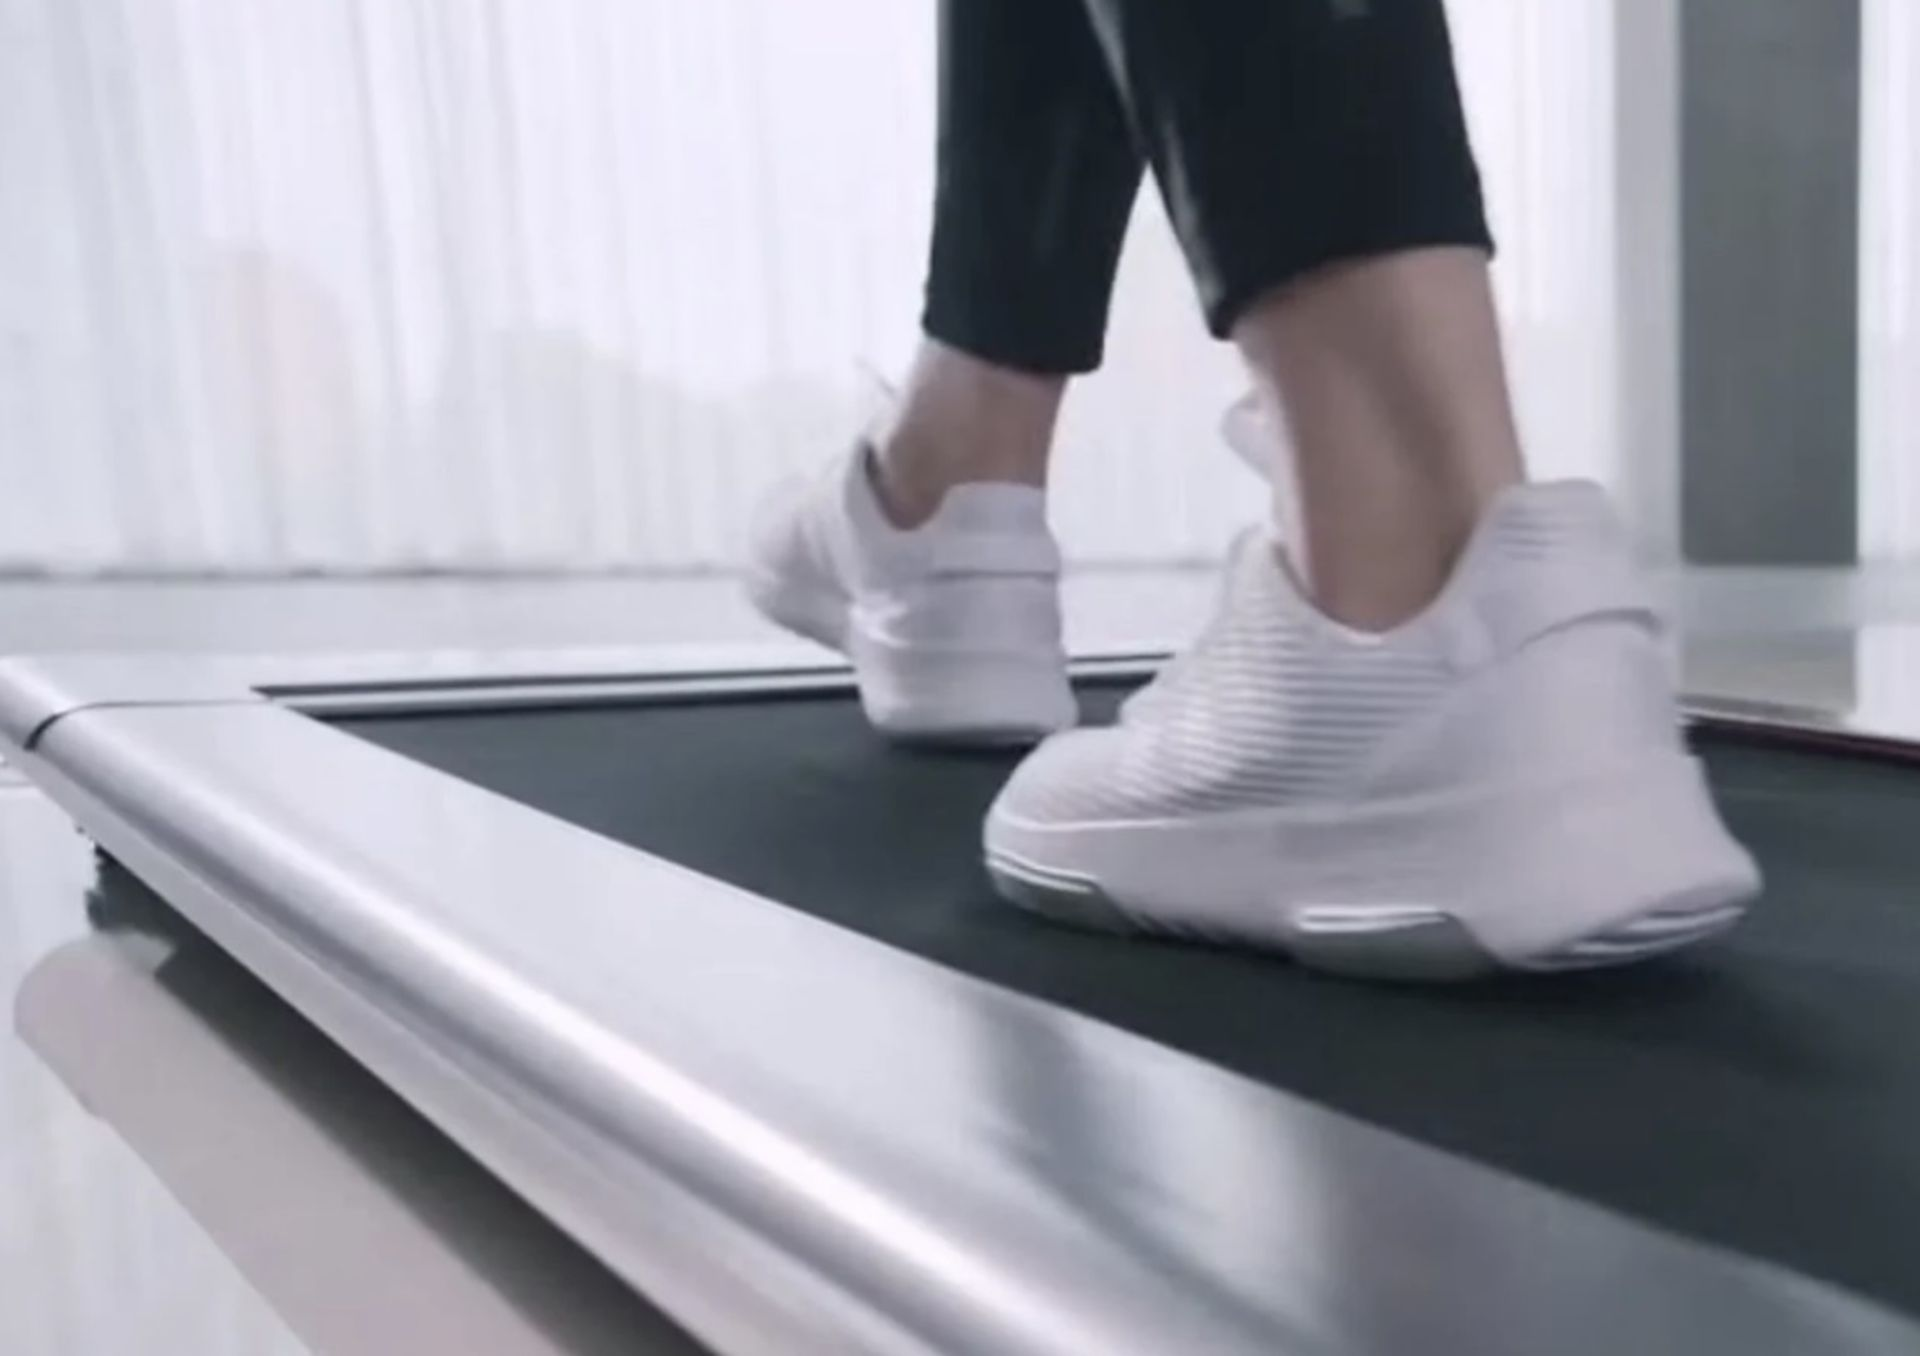 1 x Slim Tread Ultra Thin Smart Treadmill Running / Walking Machine - Lightweight With Folding - Image 8 of 19